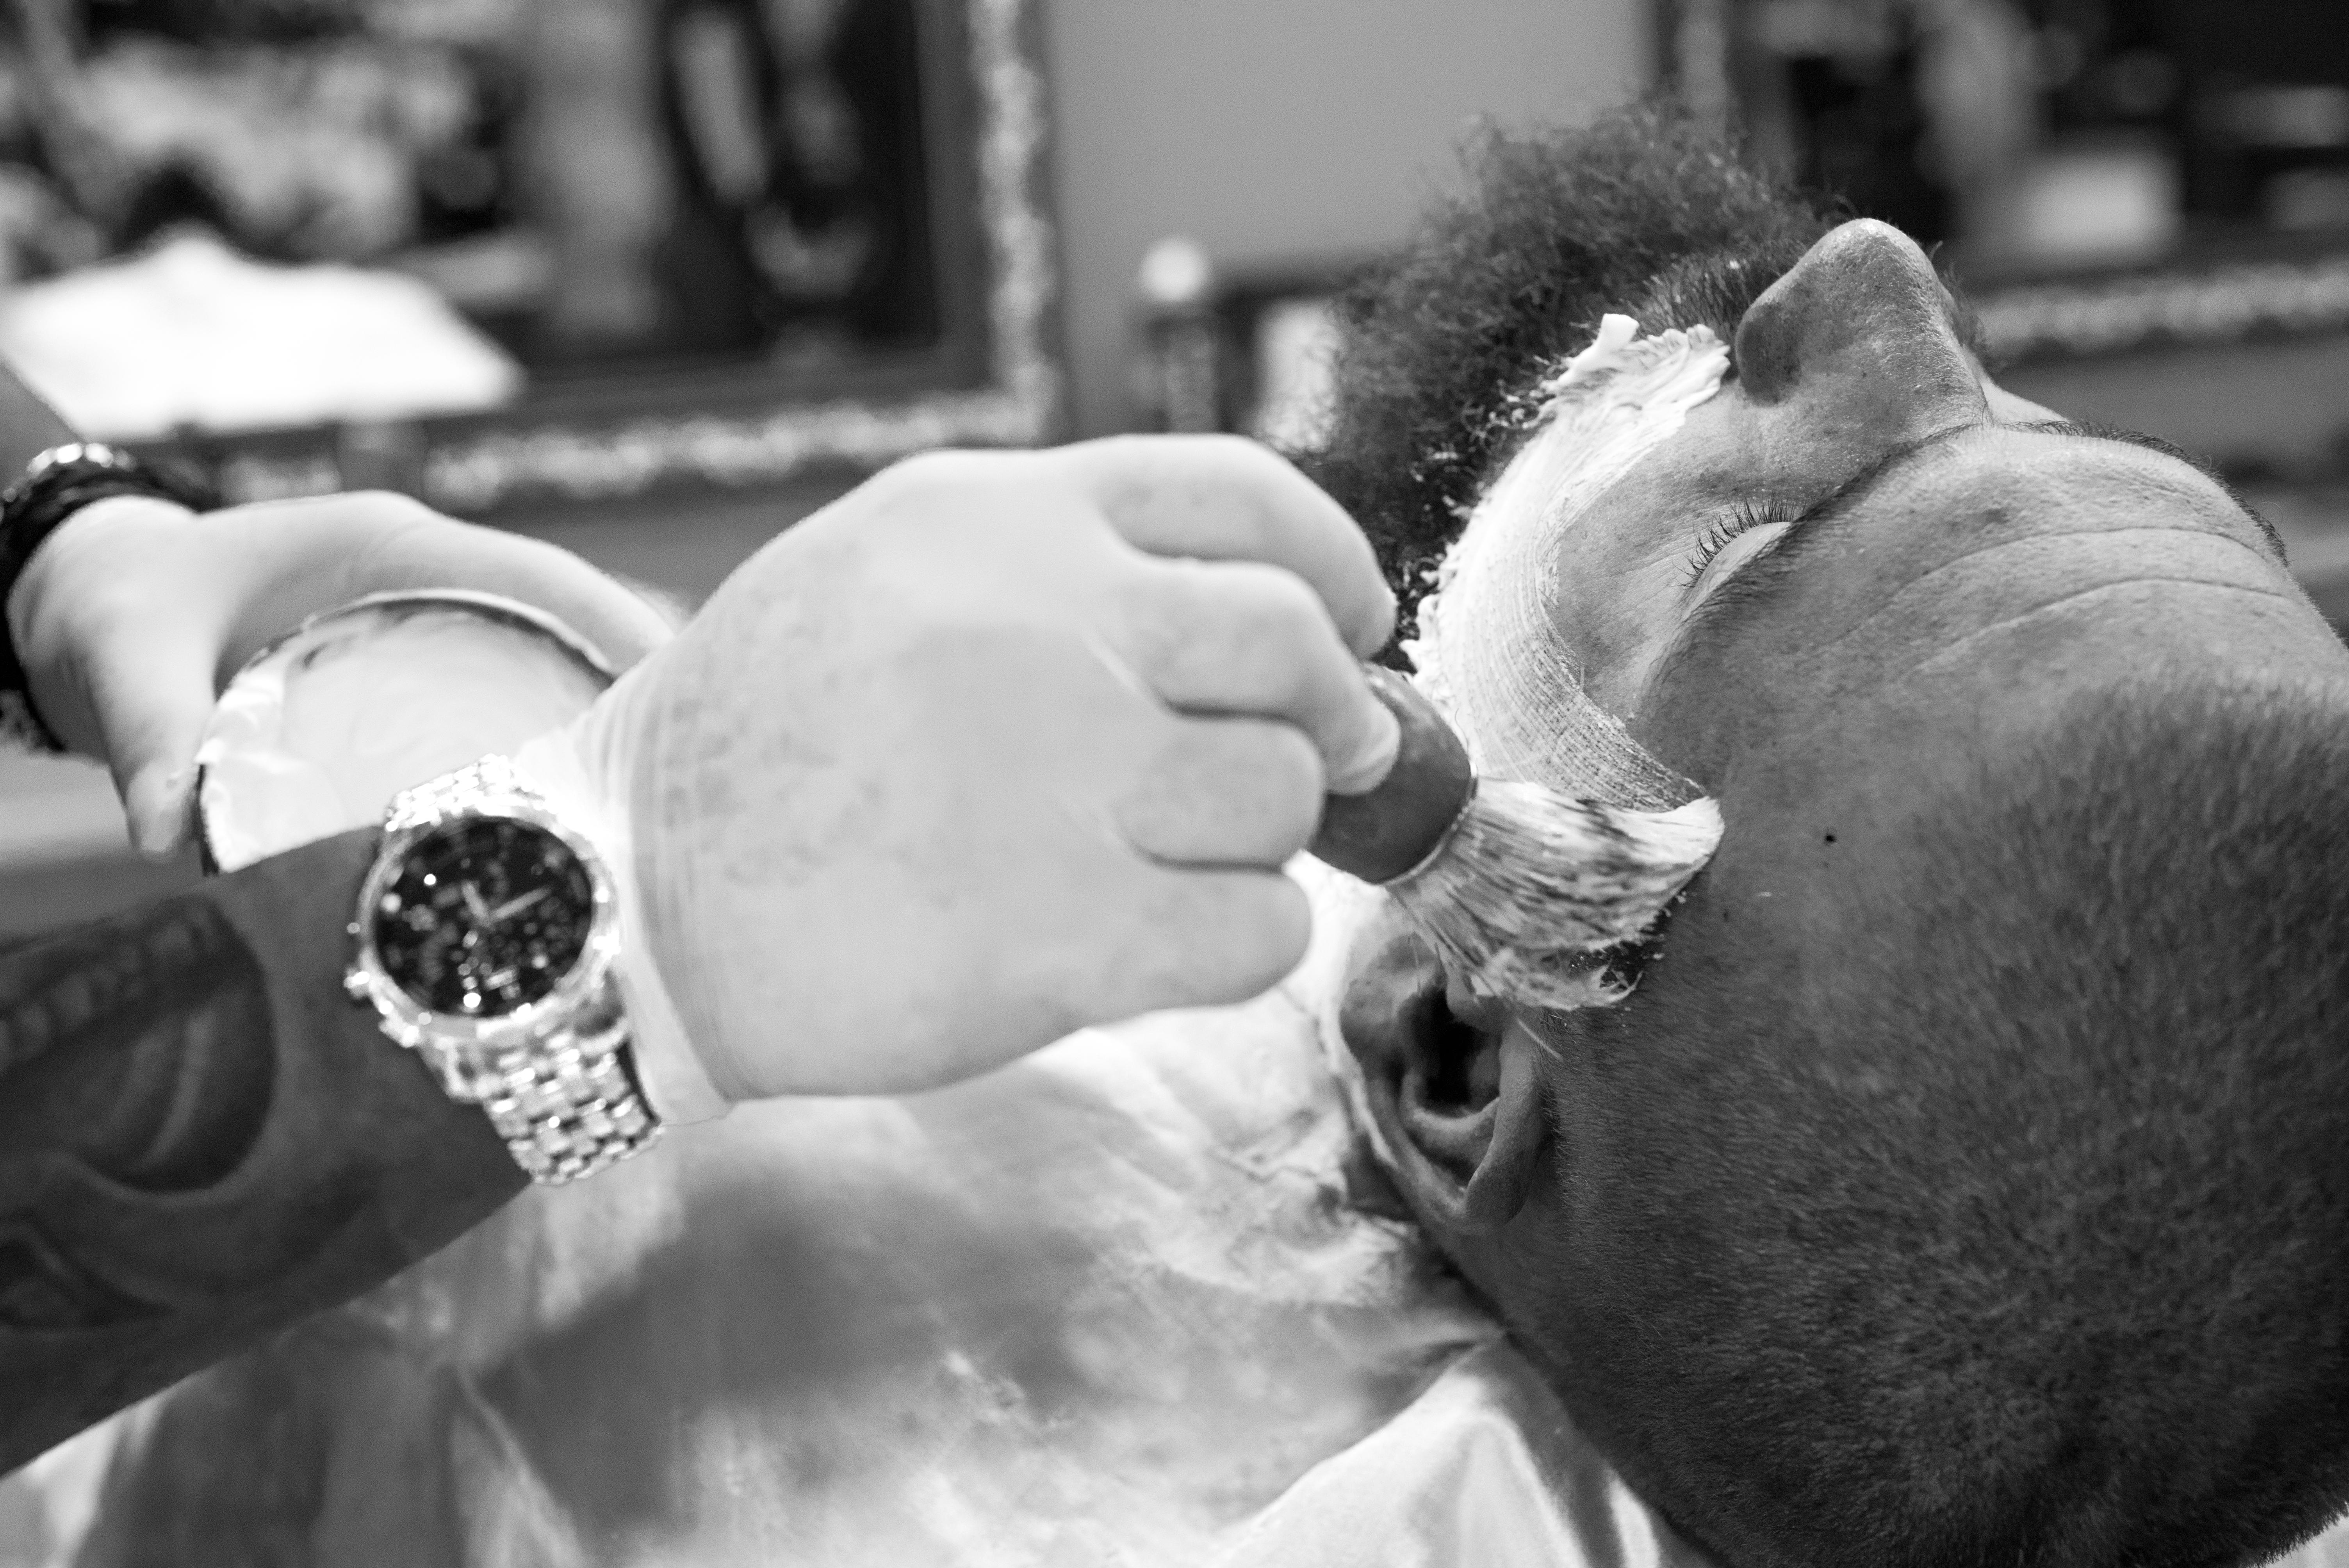 Barbearia Edom